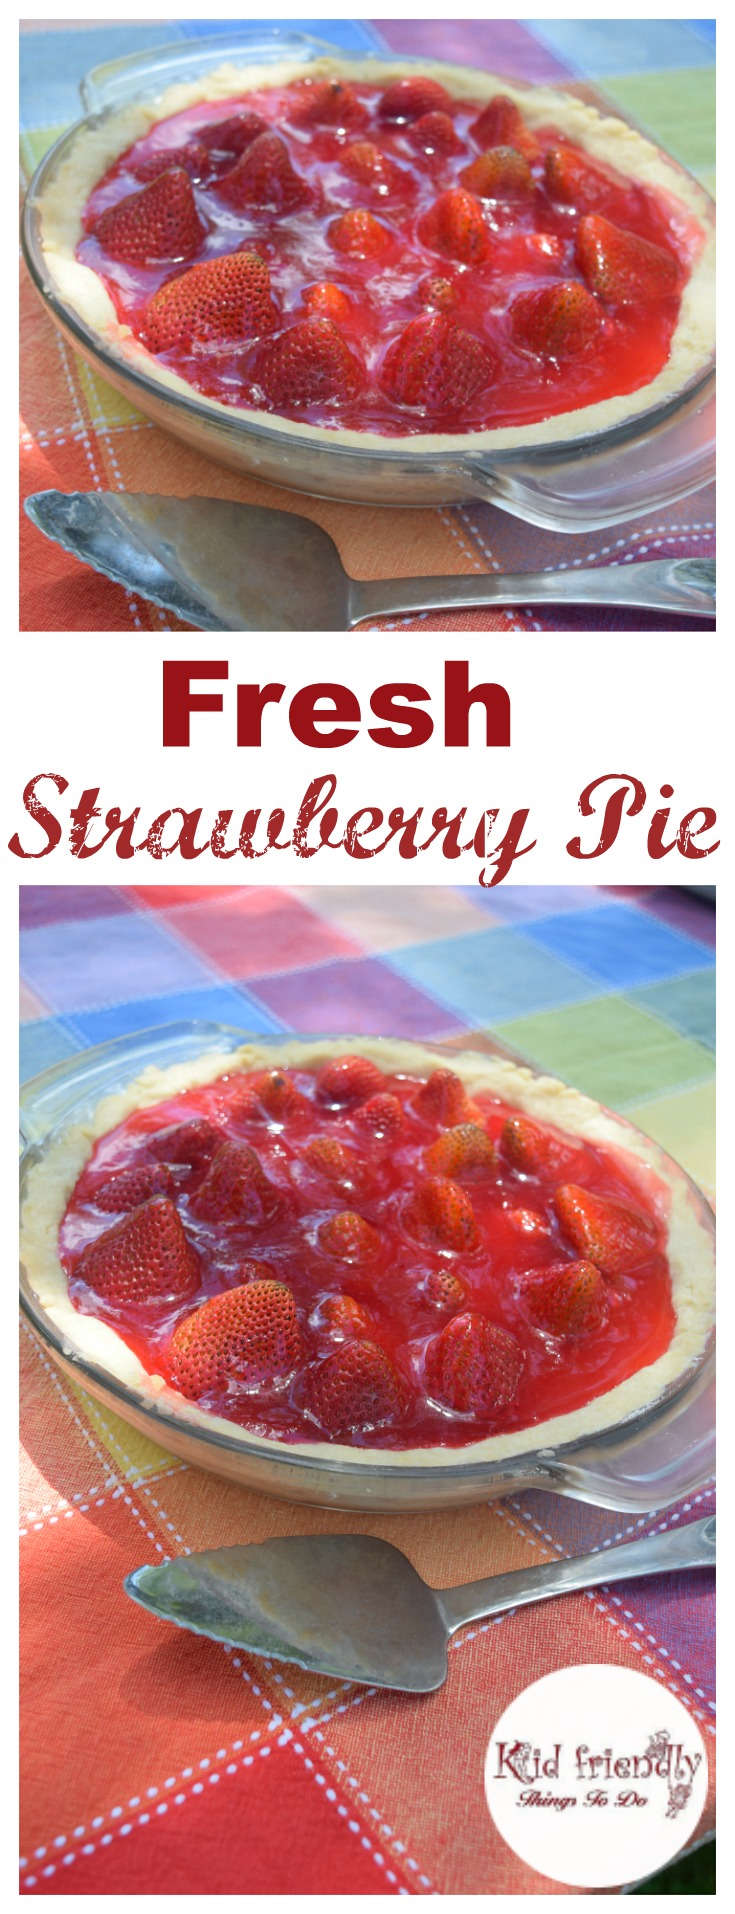 Delicious No Bake Fresh Strawberry Pie - An award winning pie. perfect for back yard summer picnics and holidays. KidFriendlyThingsToDo.com